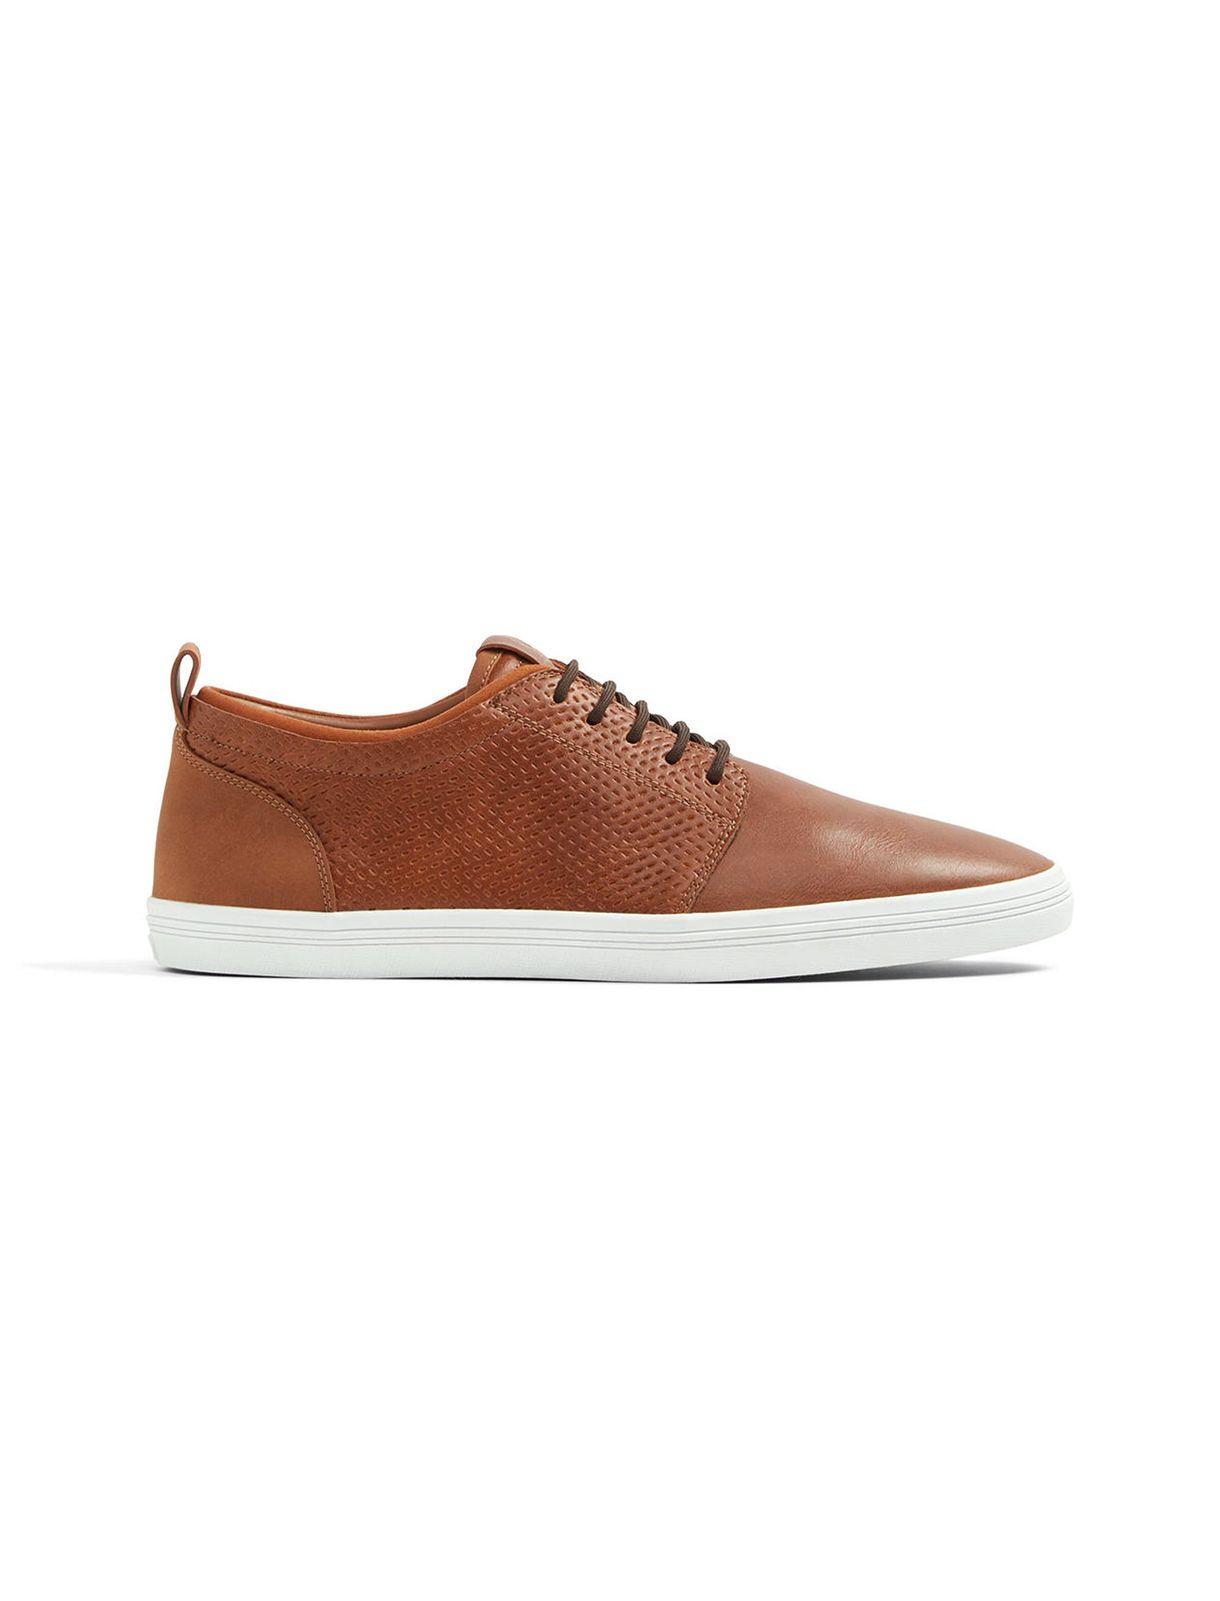 کتانی بندی مردانه – آلدو  Men Lace-Up Sneakers – Aldo